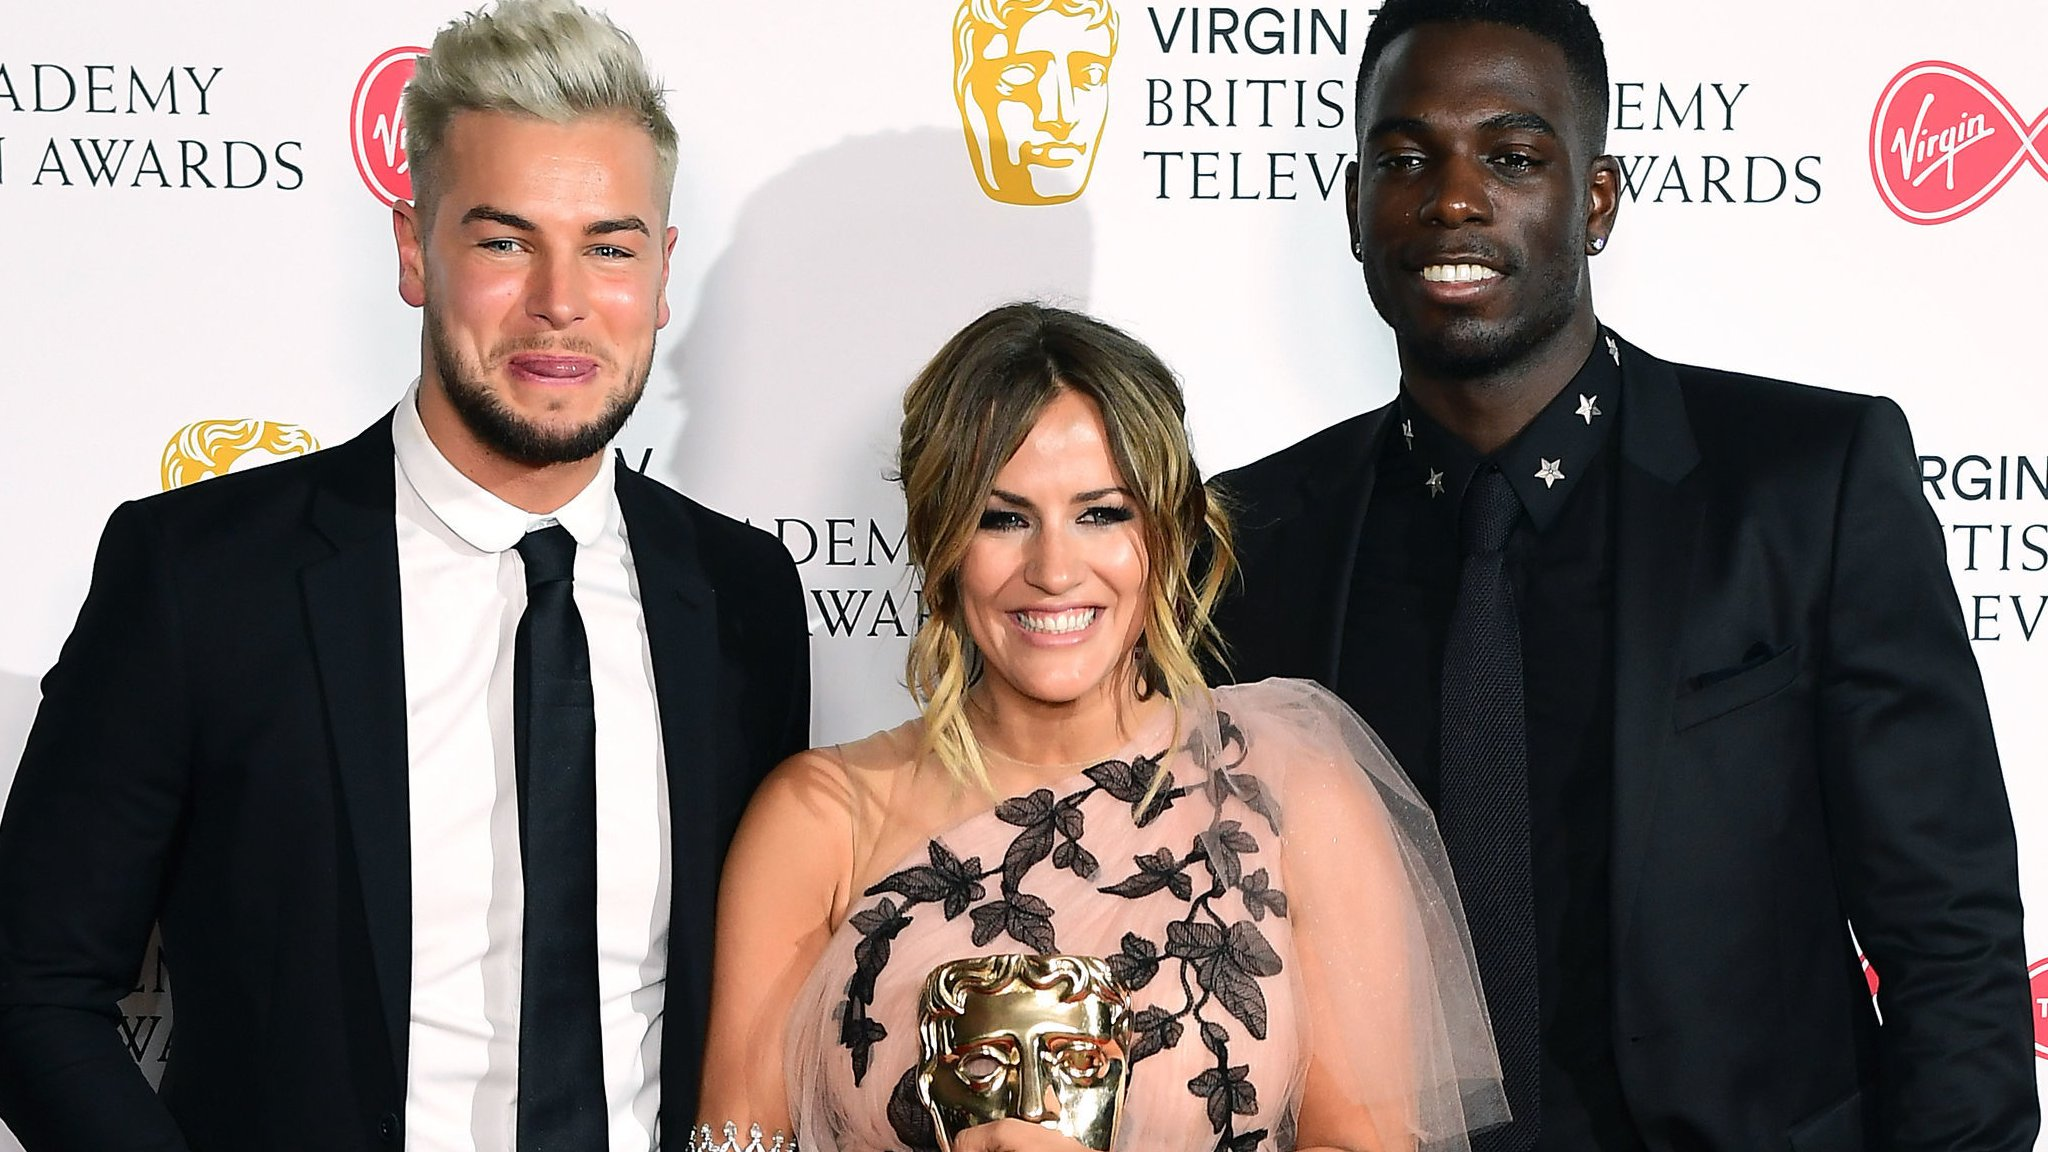 A-MNEMONIC Music Soundtracked Love Island Wins BAFTA TV Award